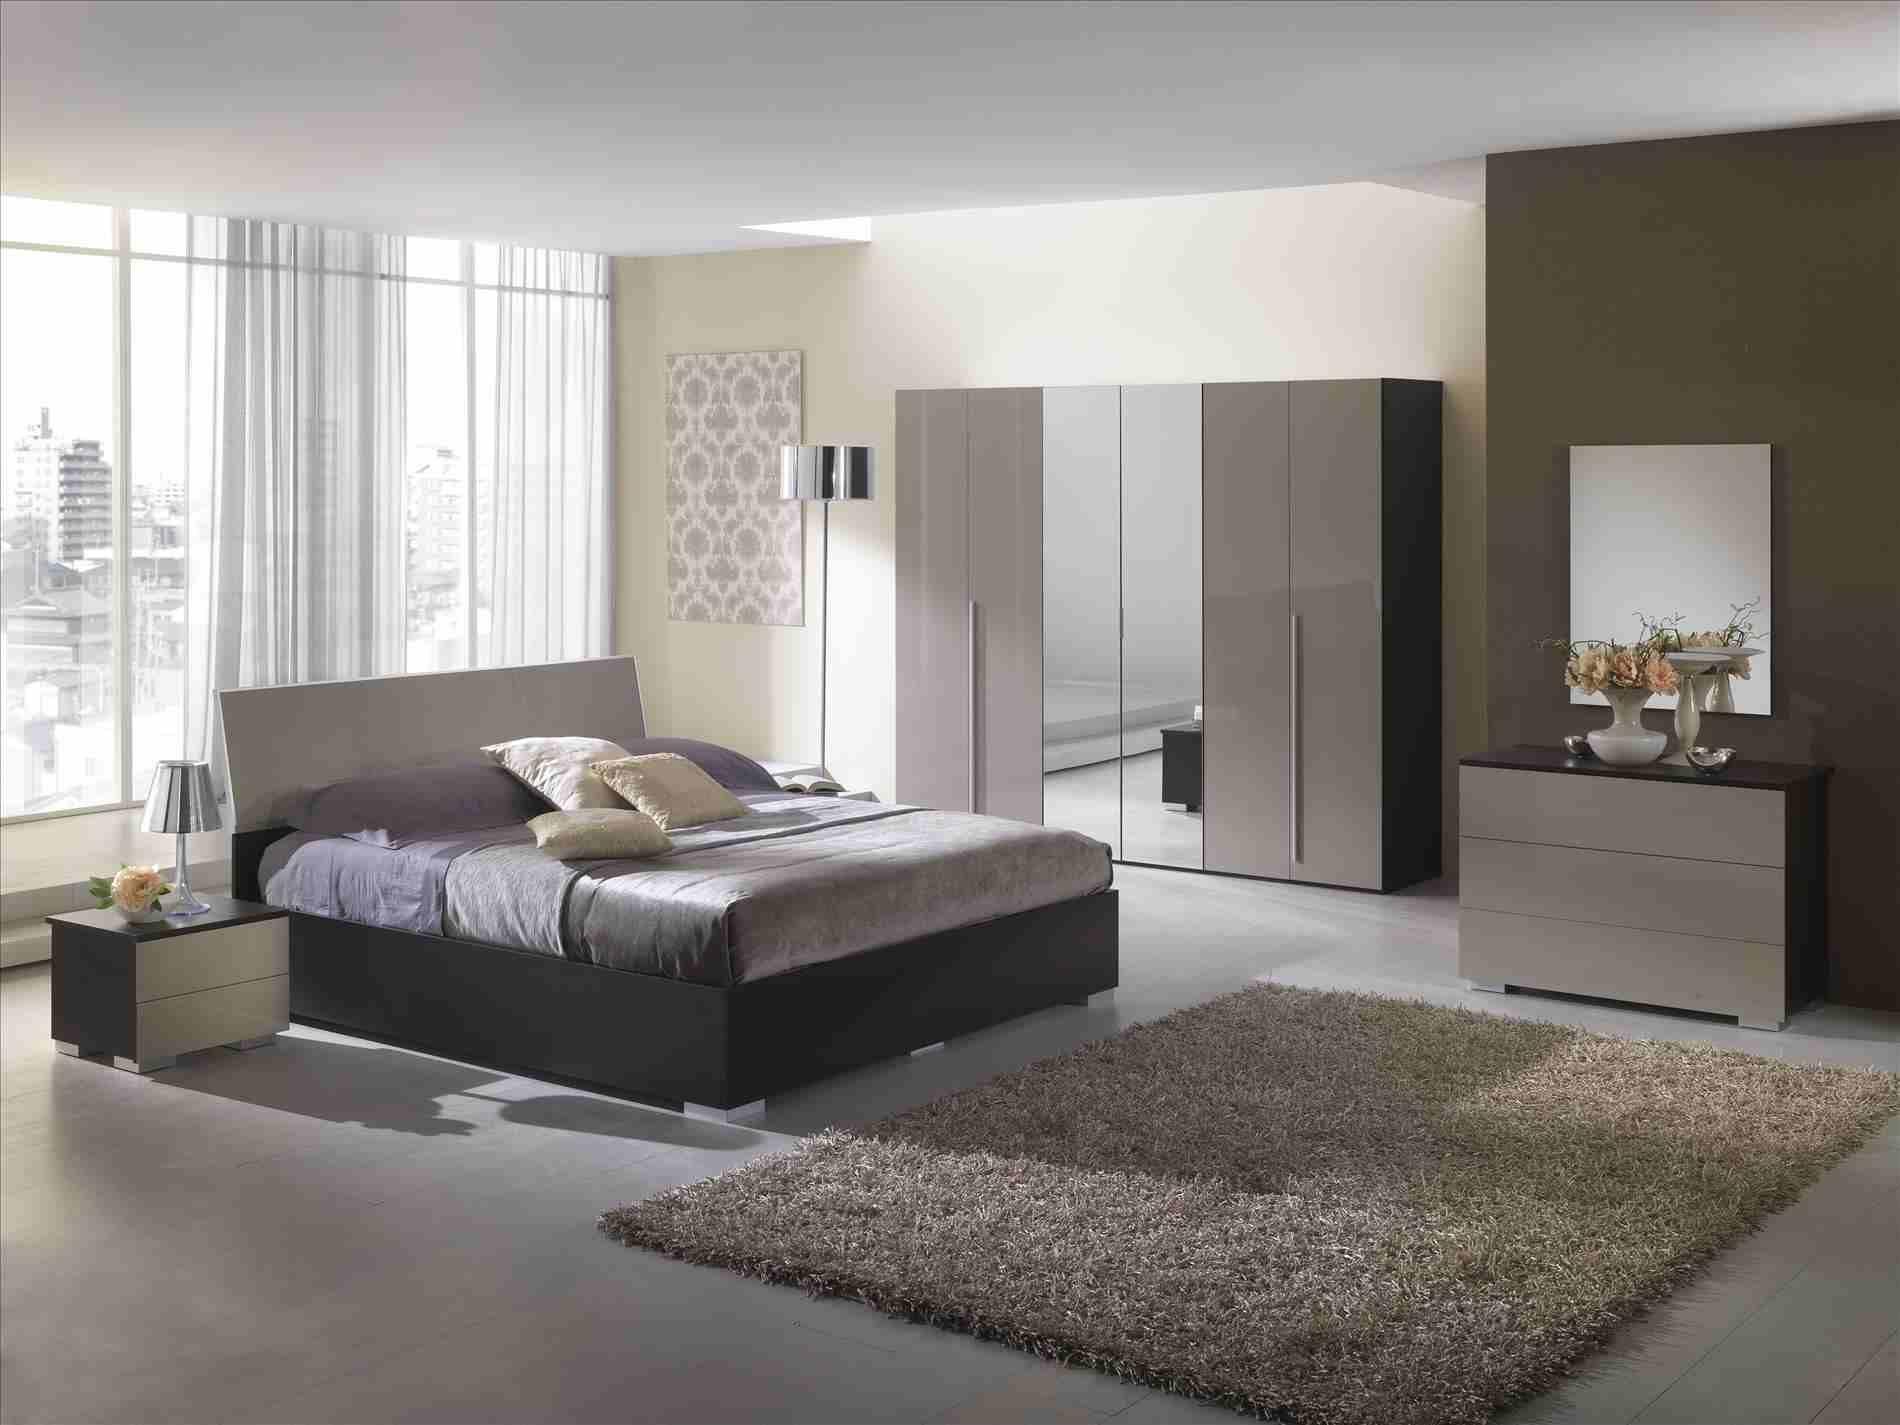 Simple Bedroom Furniture Designs Modern Bedroom Furniture